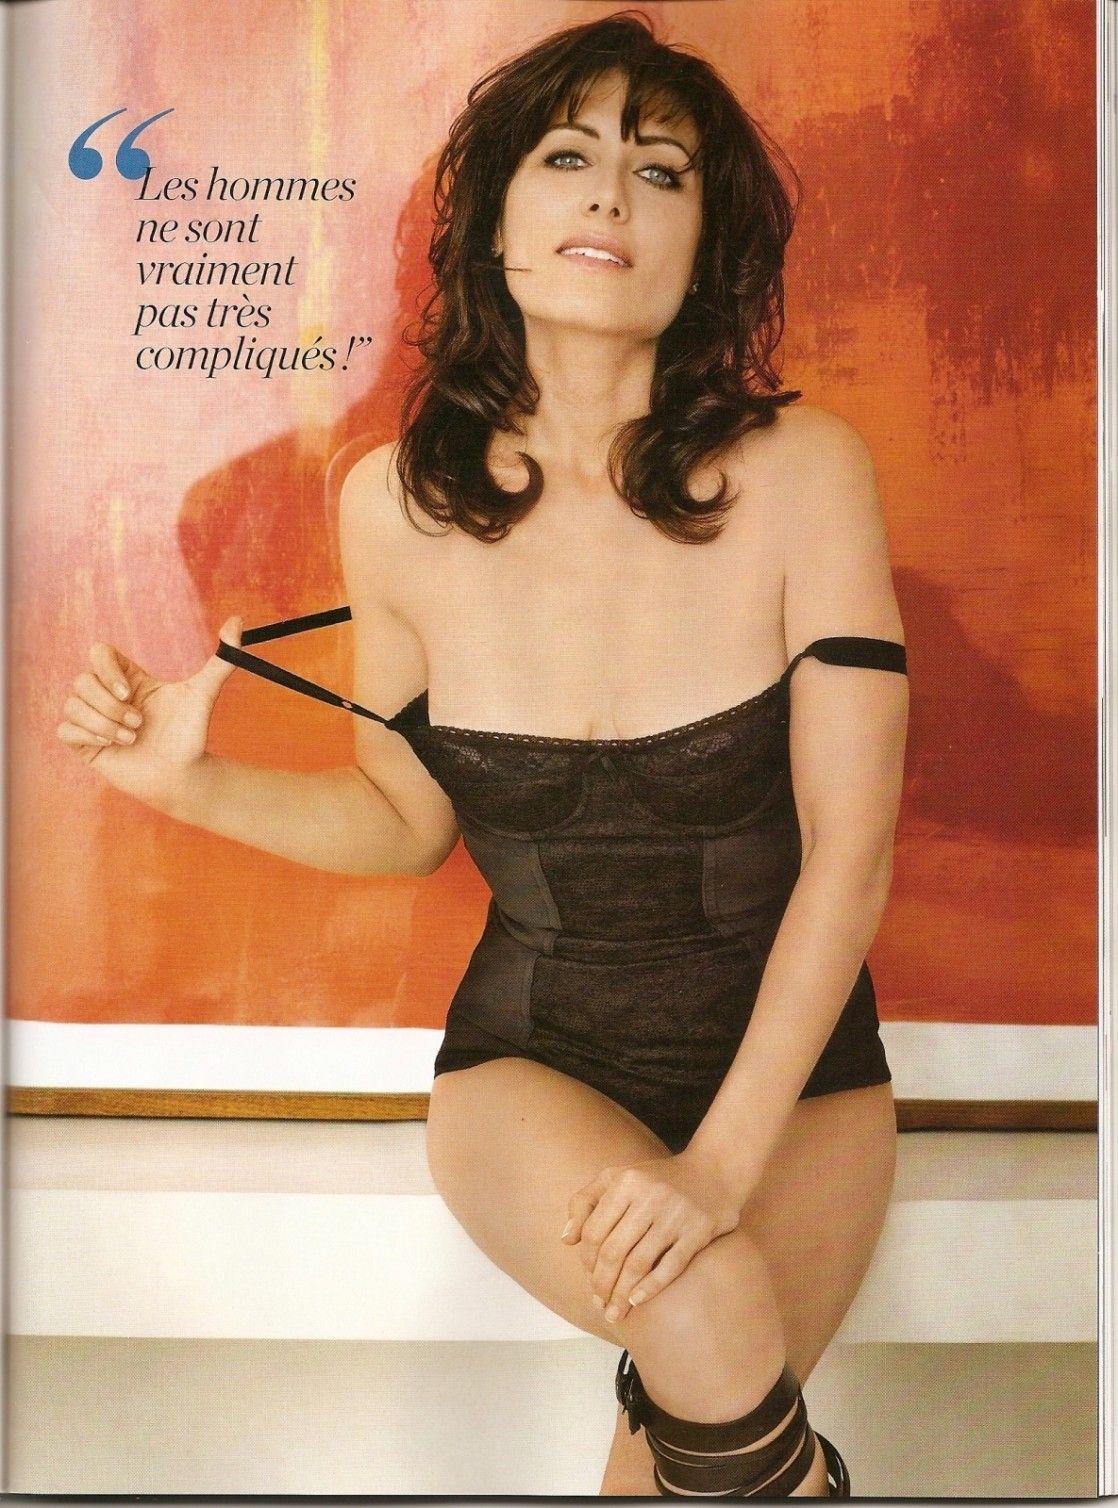 Lisa edelstein hot sex scne in house tv show